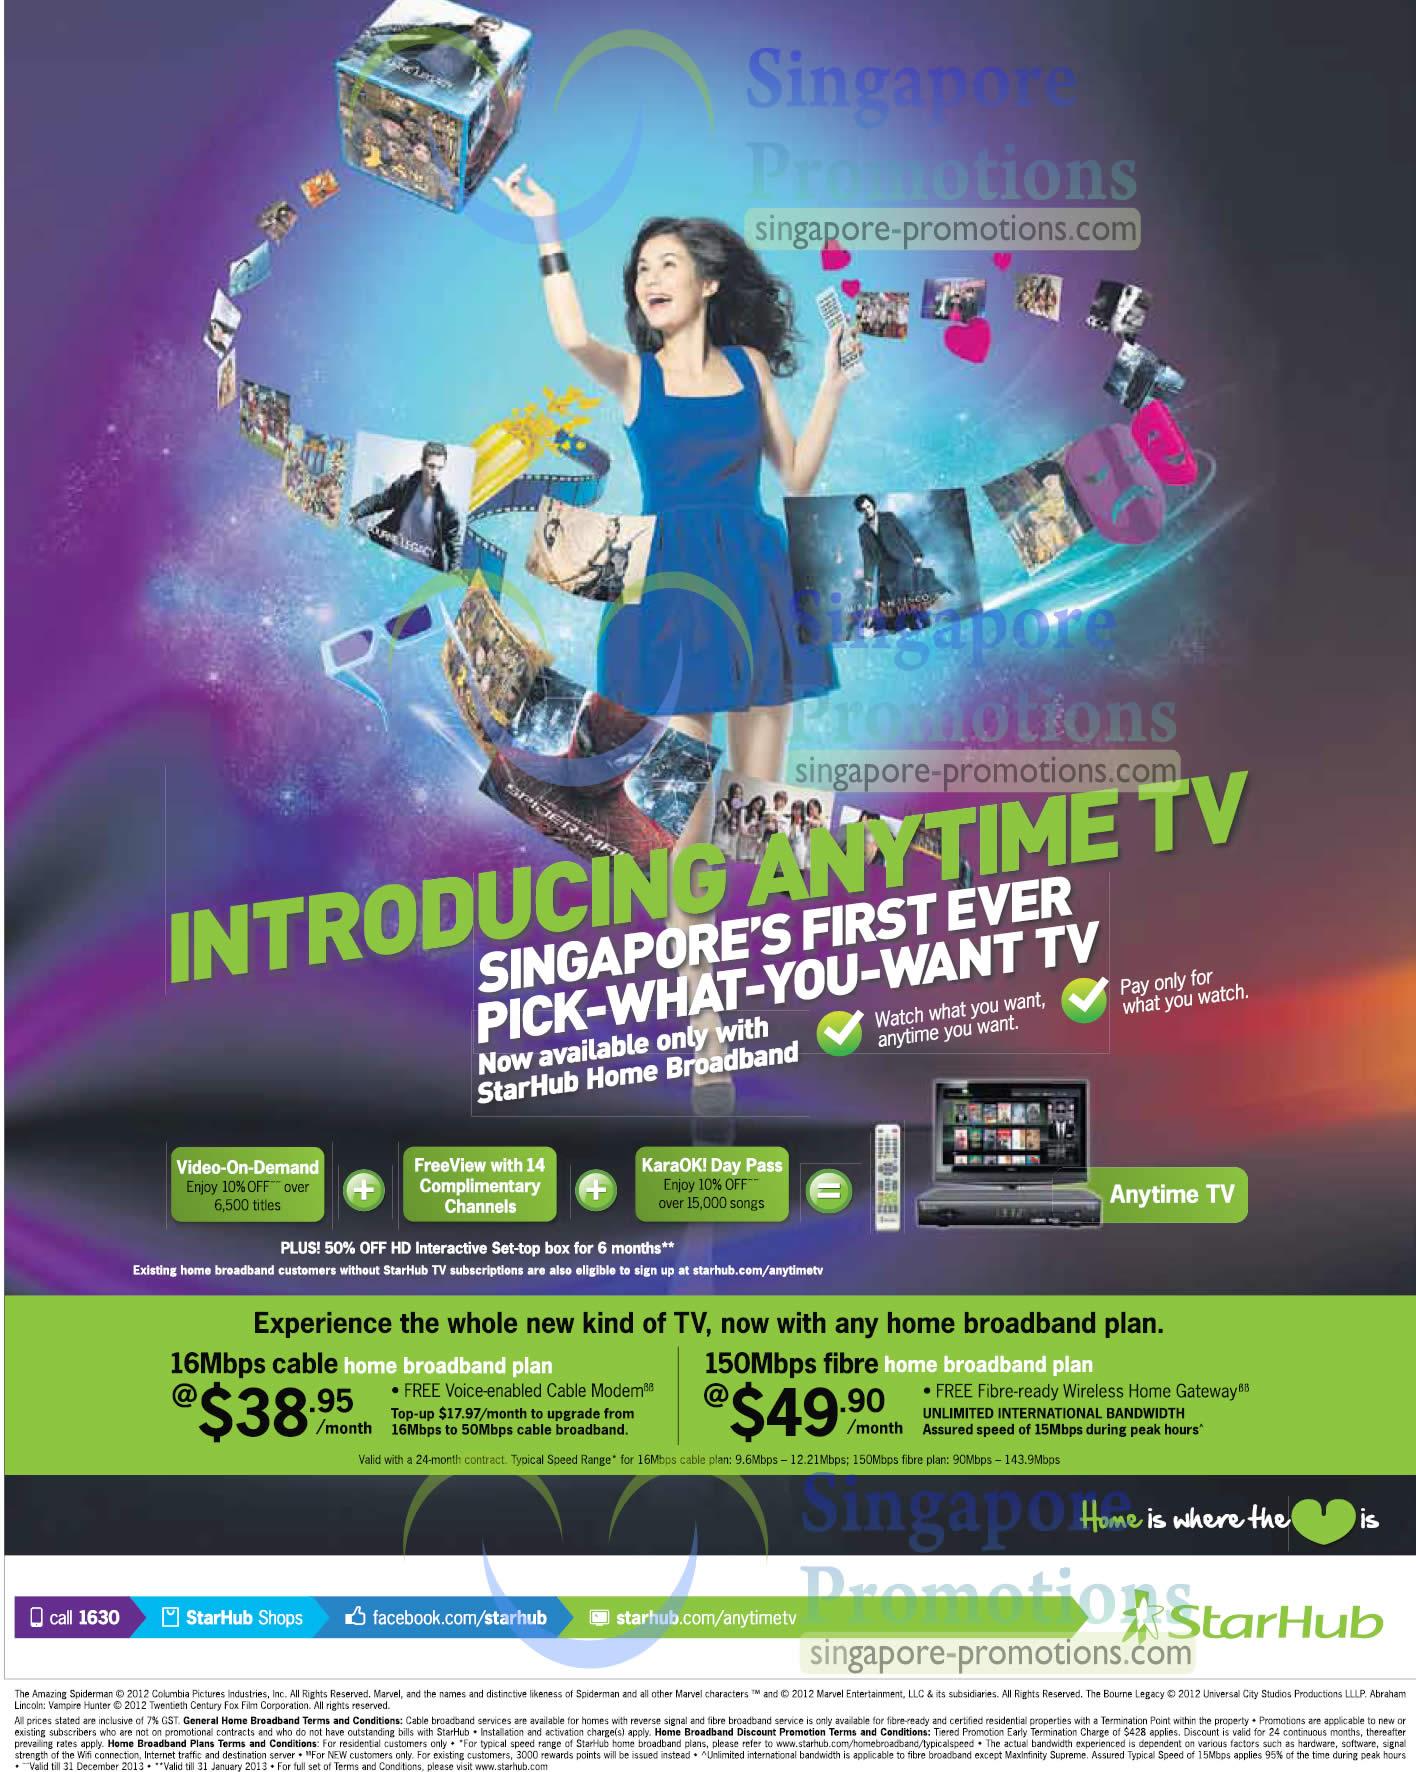 16Mbps Cable Broadband, 150Mbps Fibre Broadband